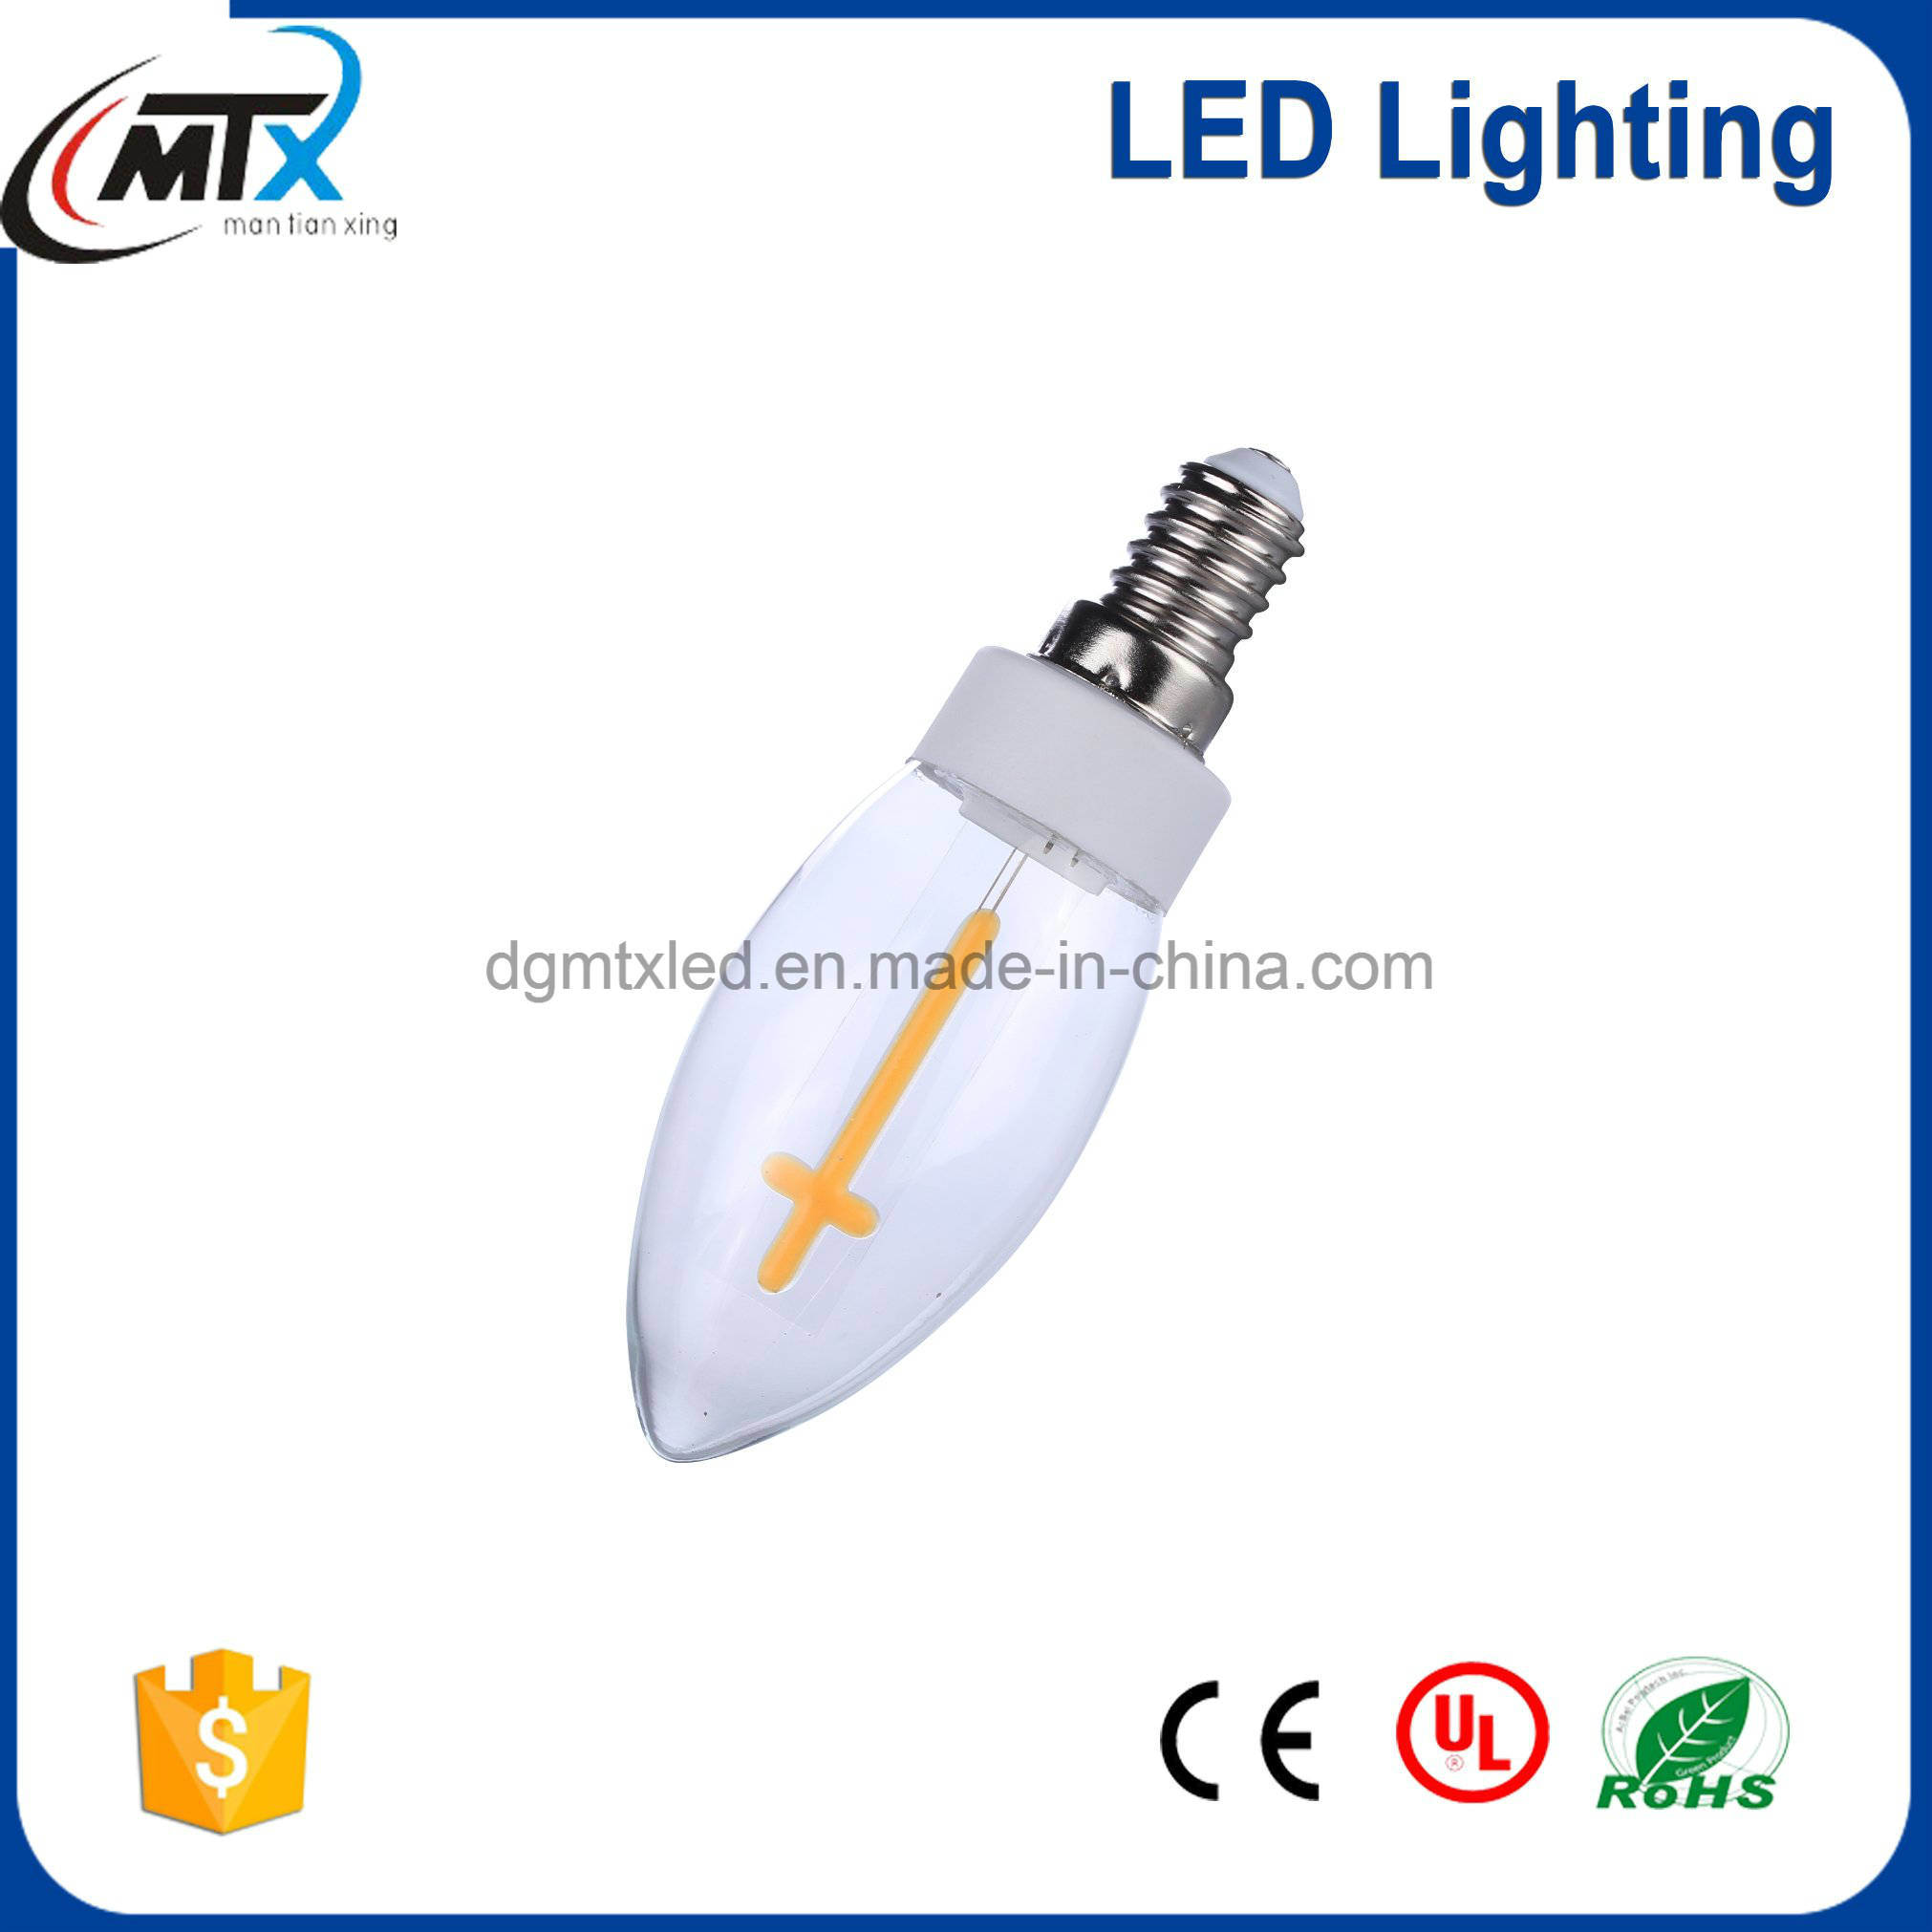 LED Patent LED Lighting series candle light bulb 110-150Lm 4W